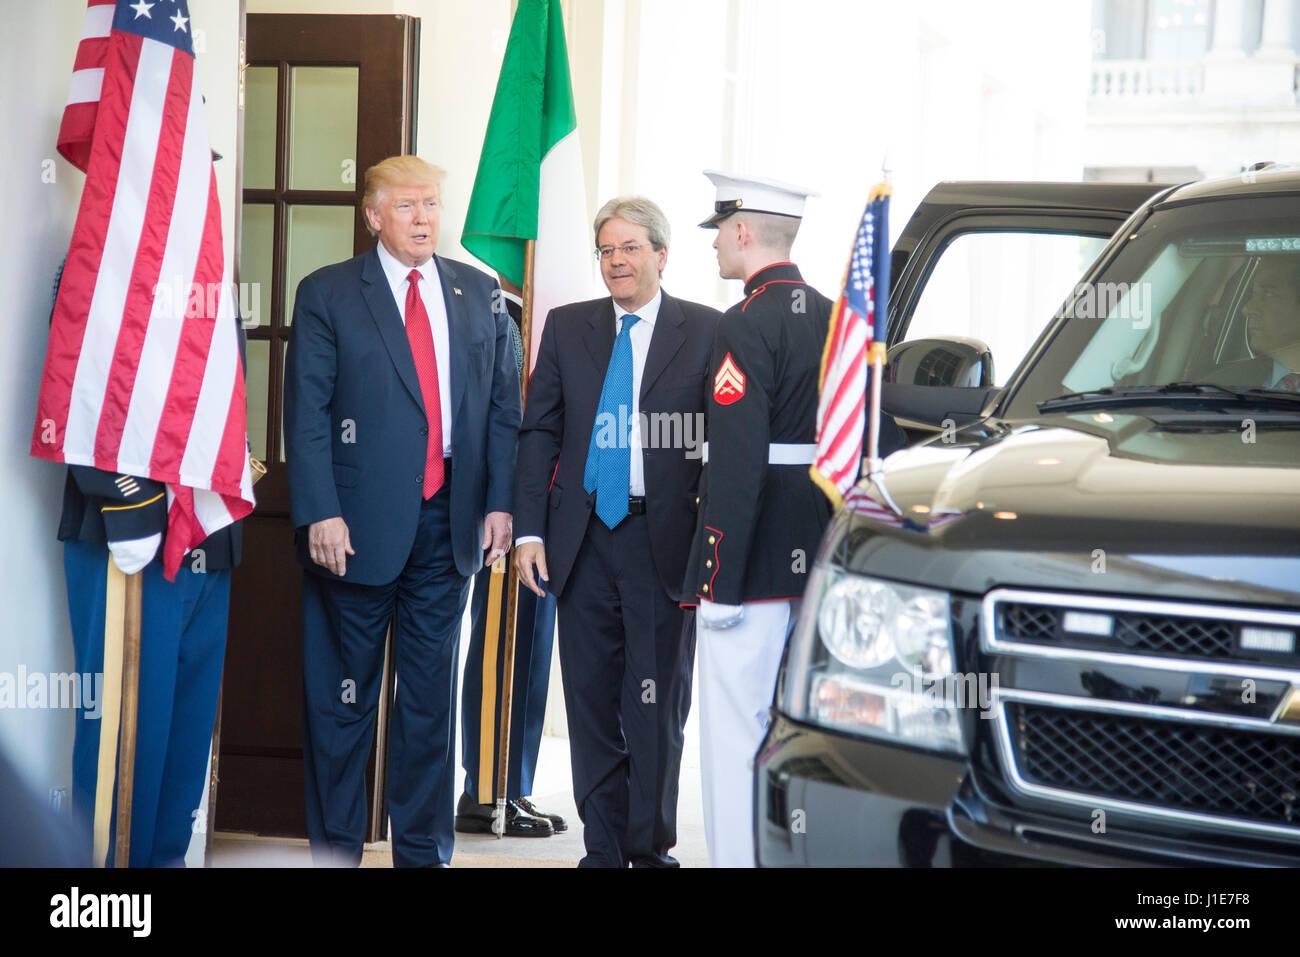 Washington, USA. 20th Apr, 2017. Washington DC, April 20, 2017, USA: President Donald J Trump welcomes the Italian - Stock Image